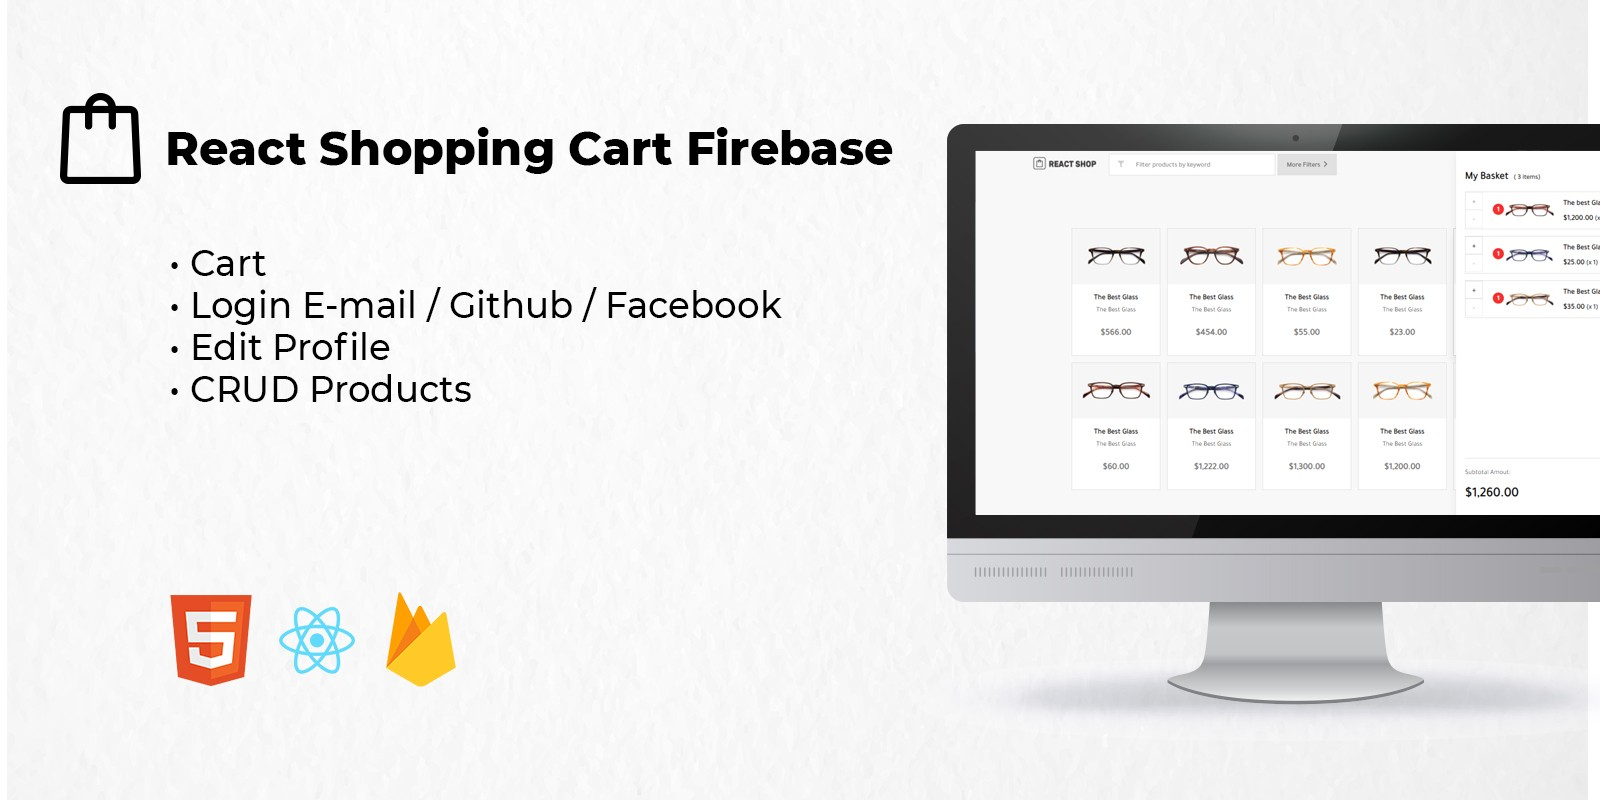 React Shopping Cart Firebase